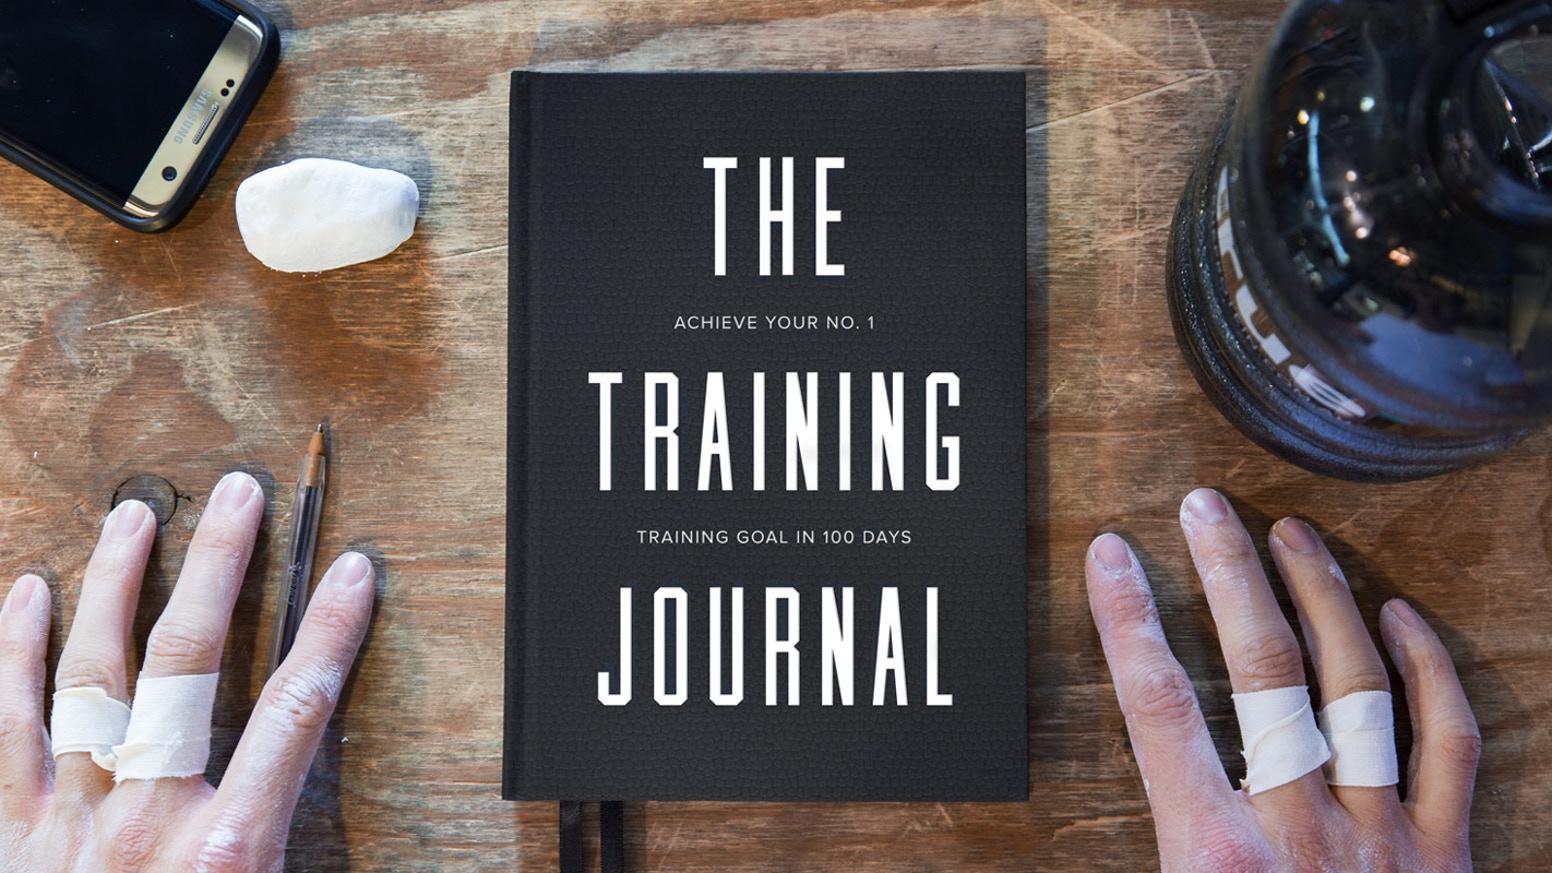 TheTrainingJournal